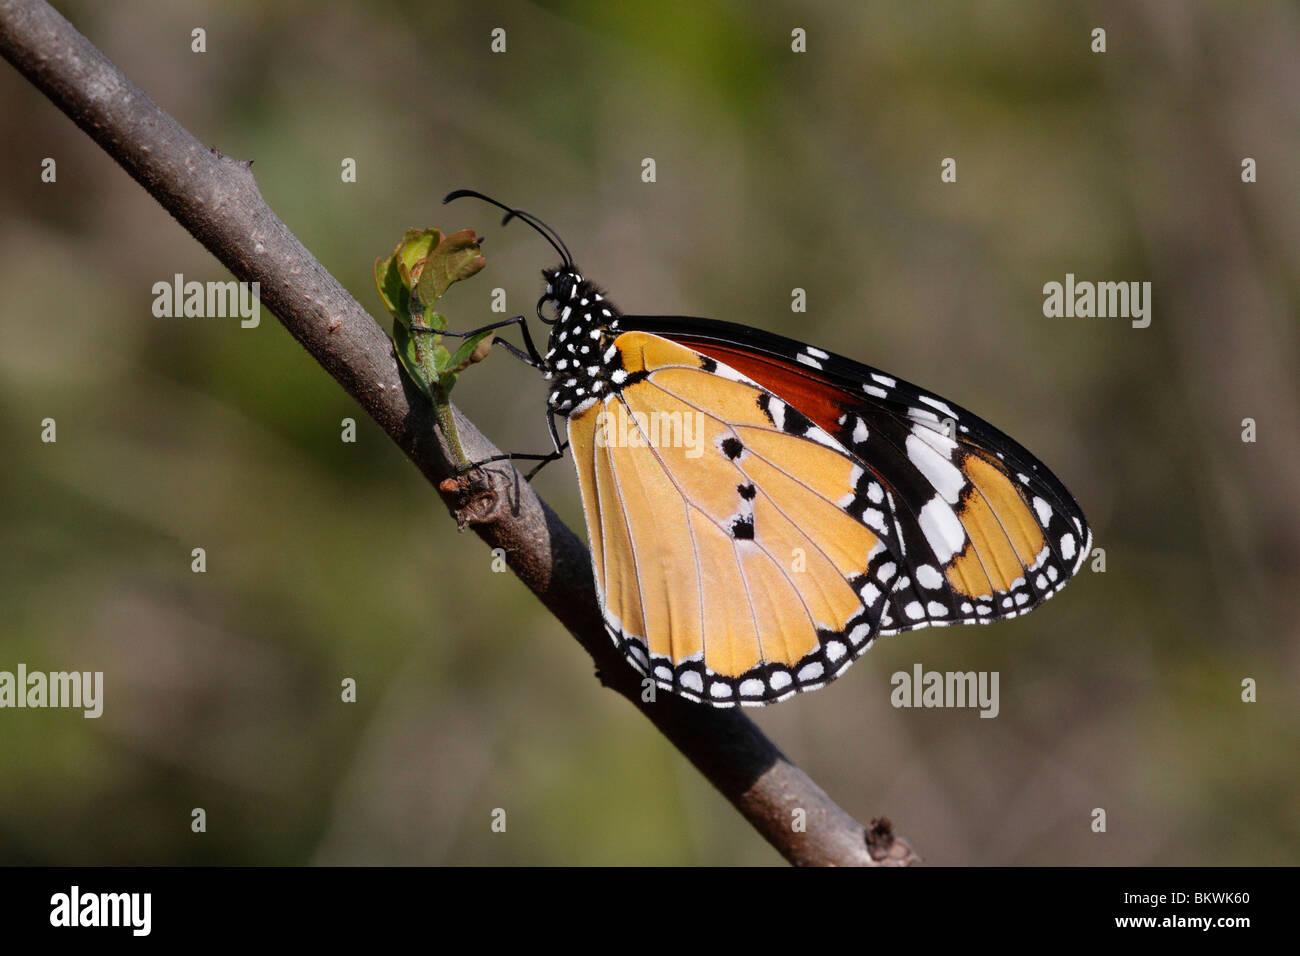 Plain Tiger Butterfly, Danaus chrysippus, Keoladeo NP, Bharatpur, India - Stock Image